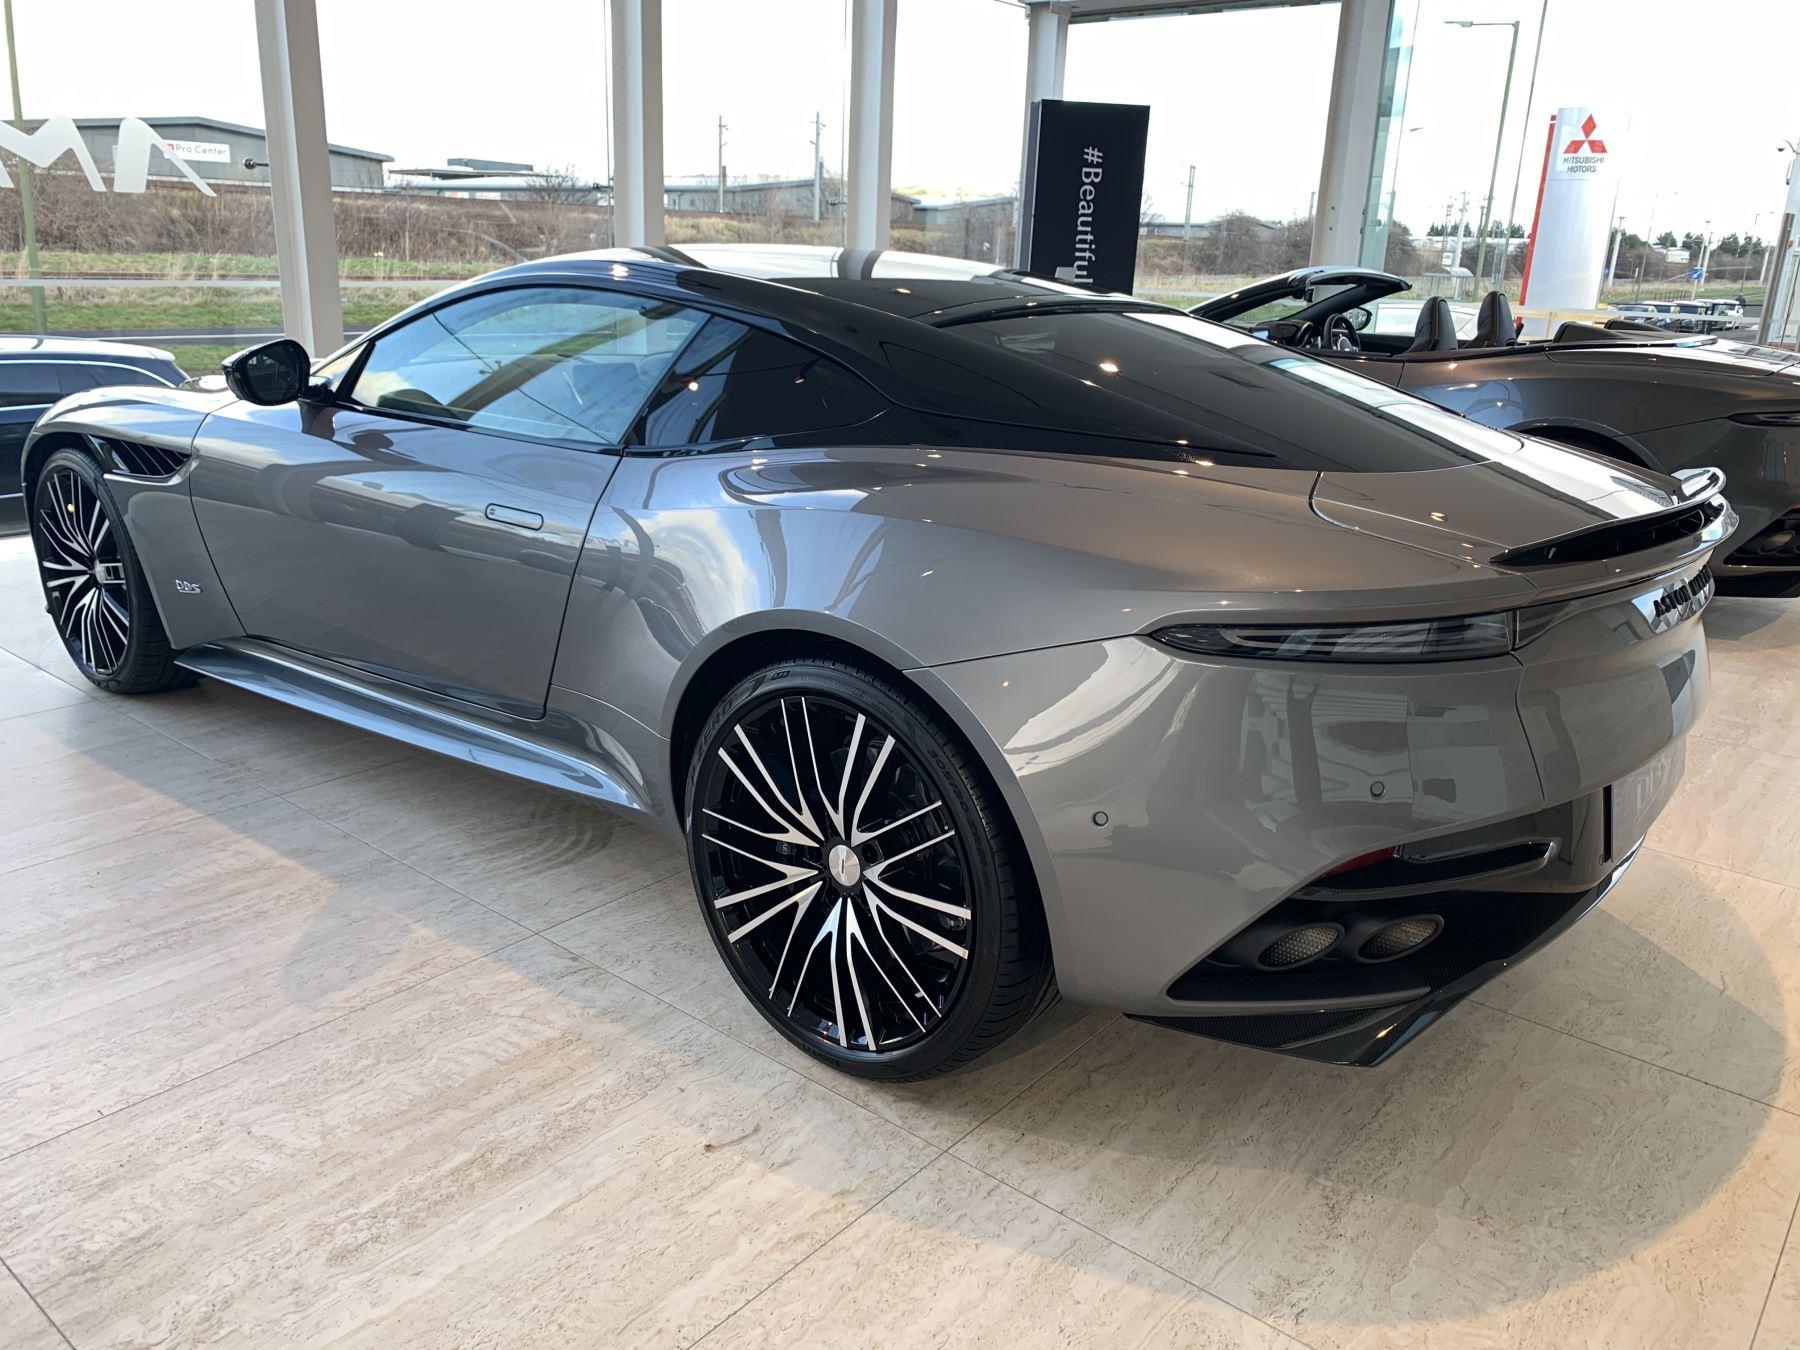 Aston Martin DBS Superleggera V12 Superleggera 2dr Touchtronic Auto image 2